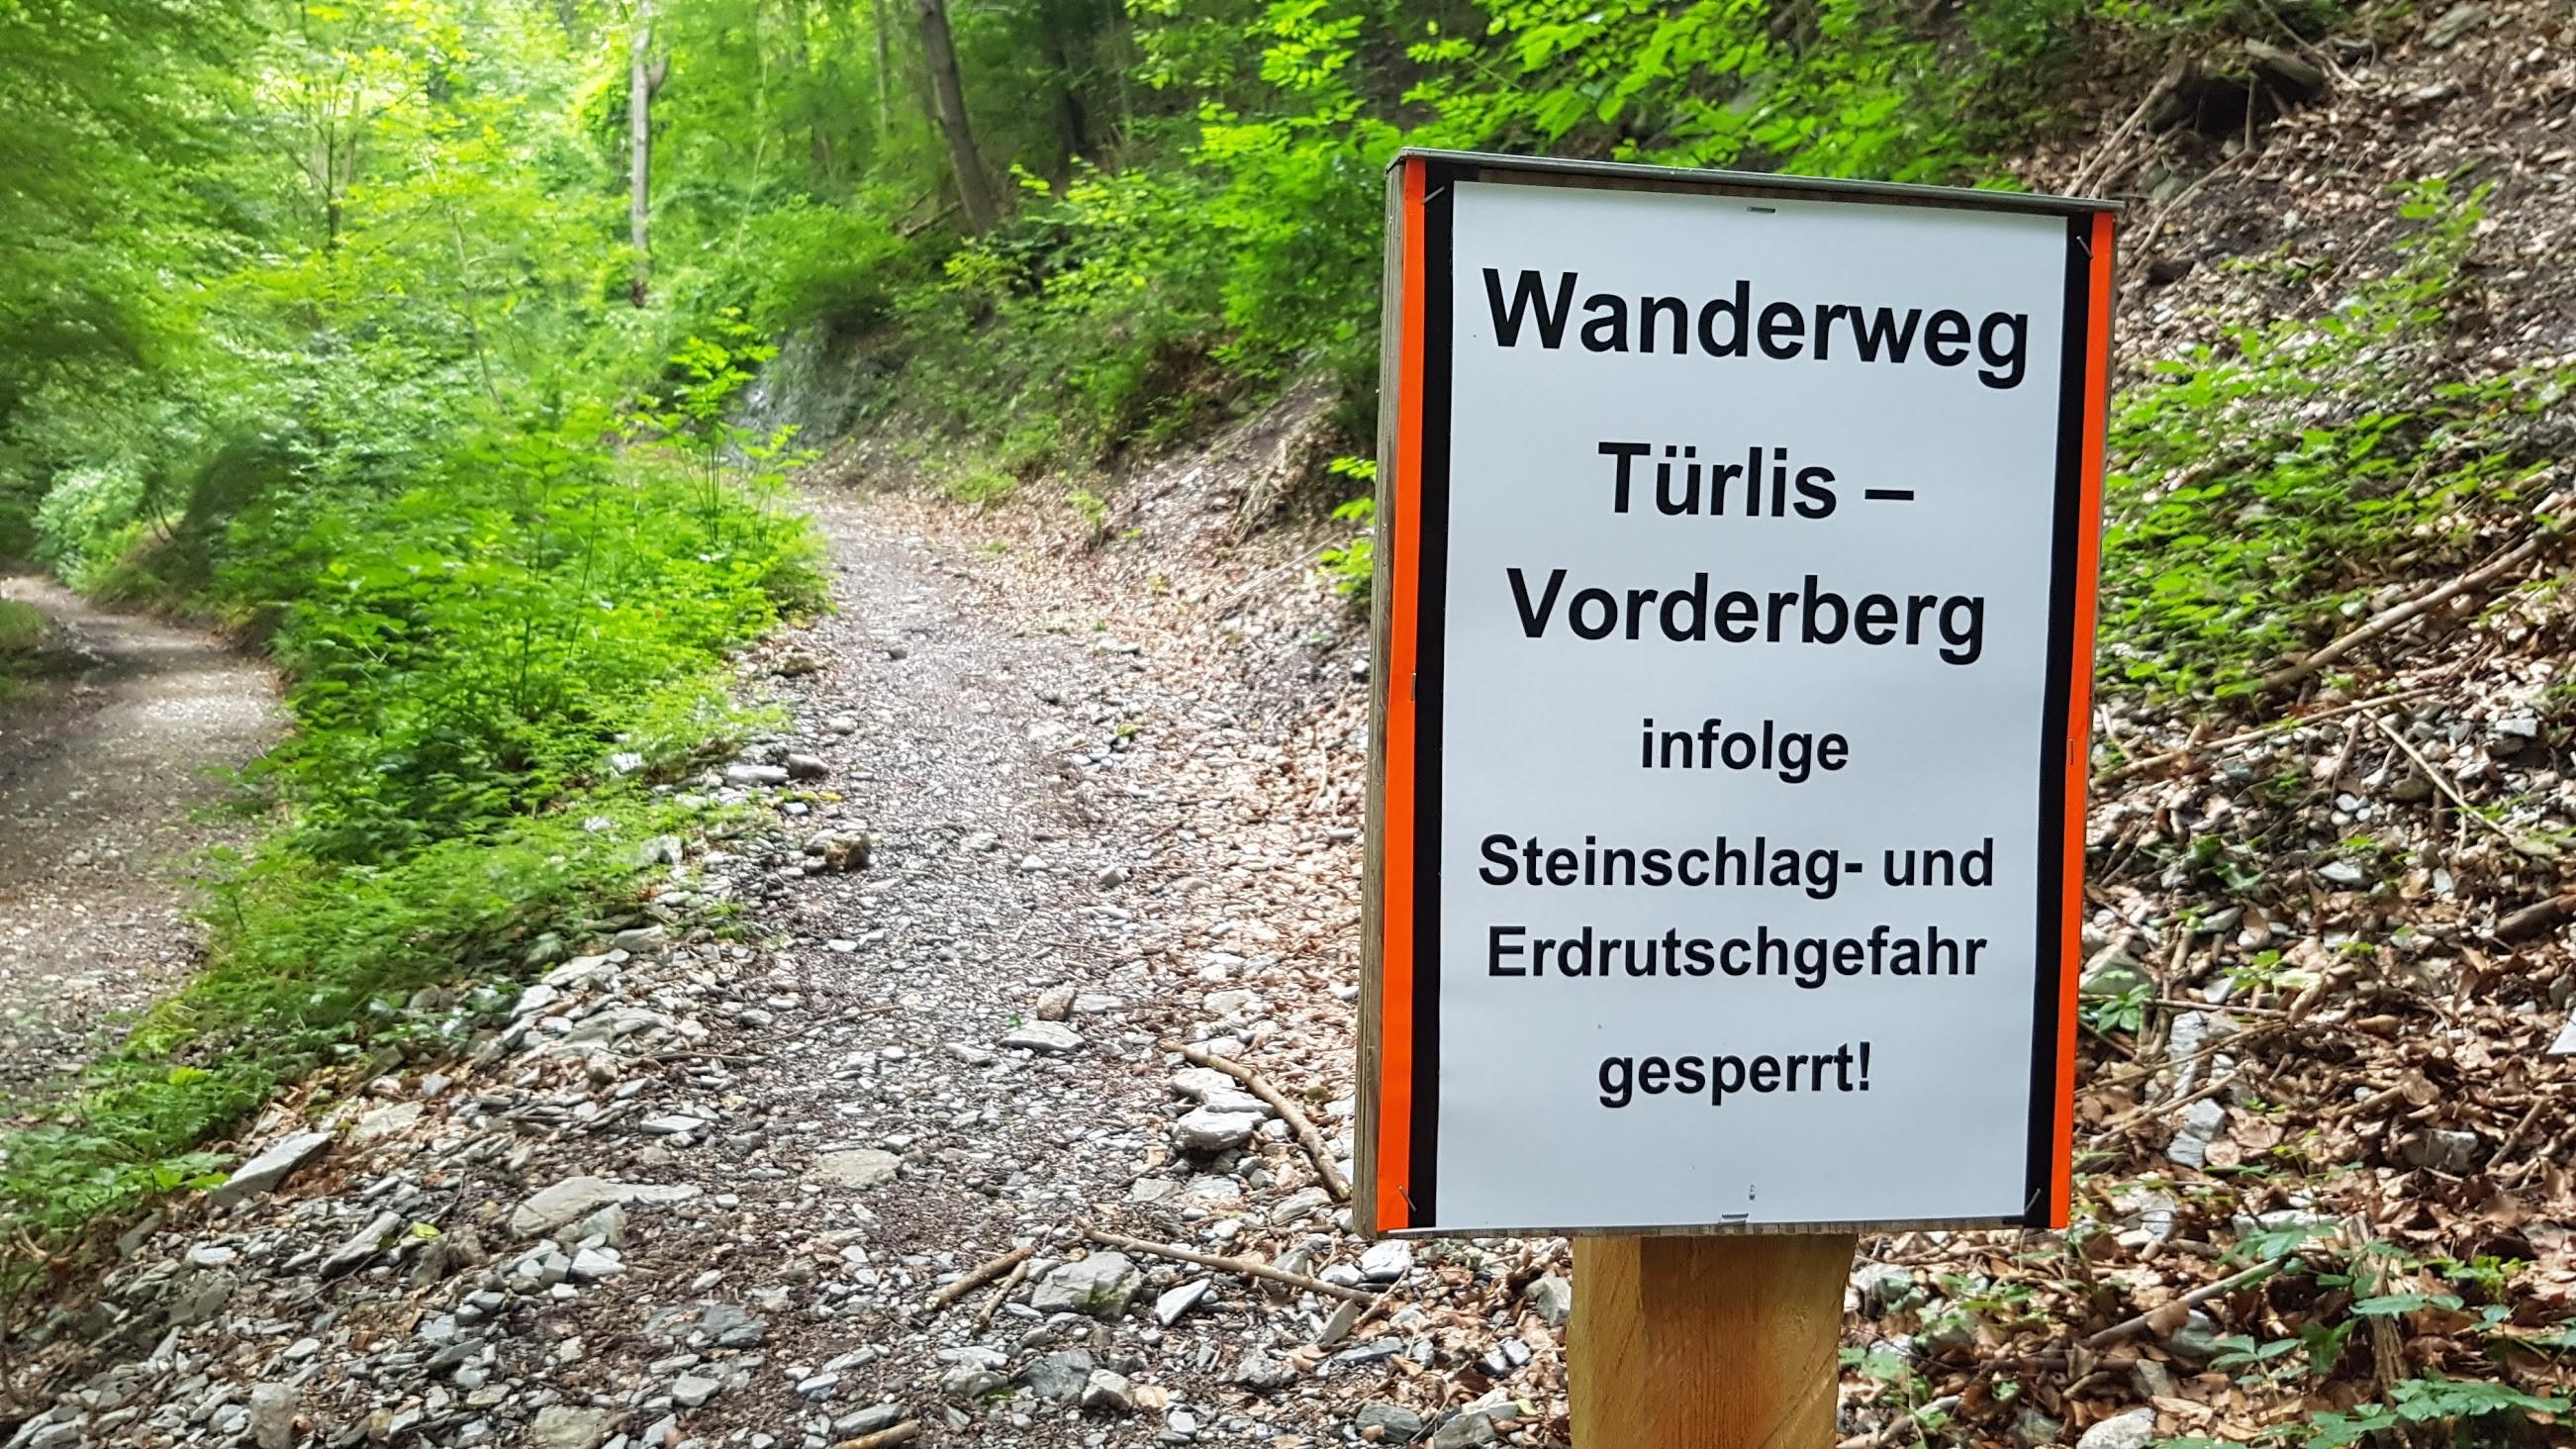 Weg zum Regitzer Spitz via Türlisweg gesperrt